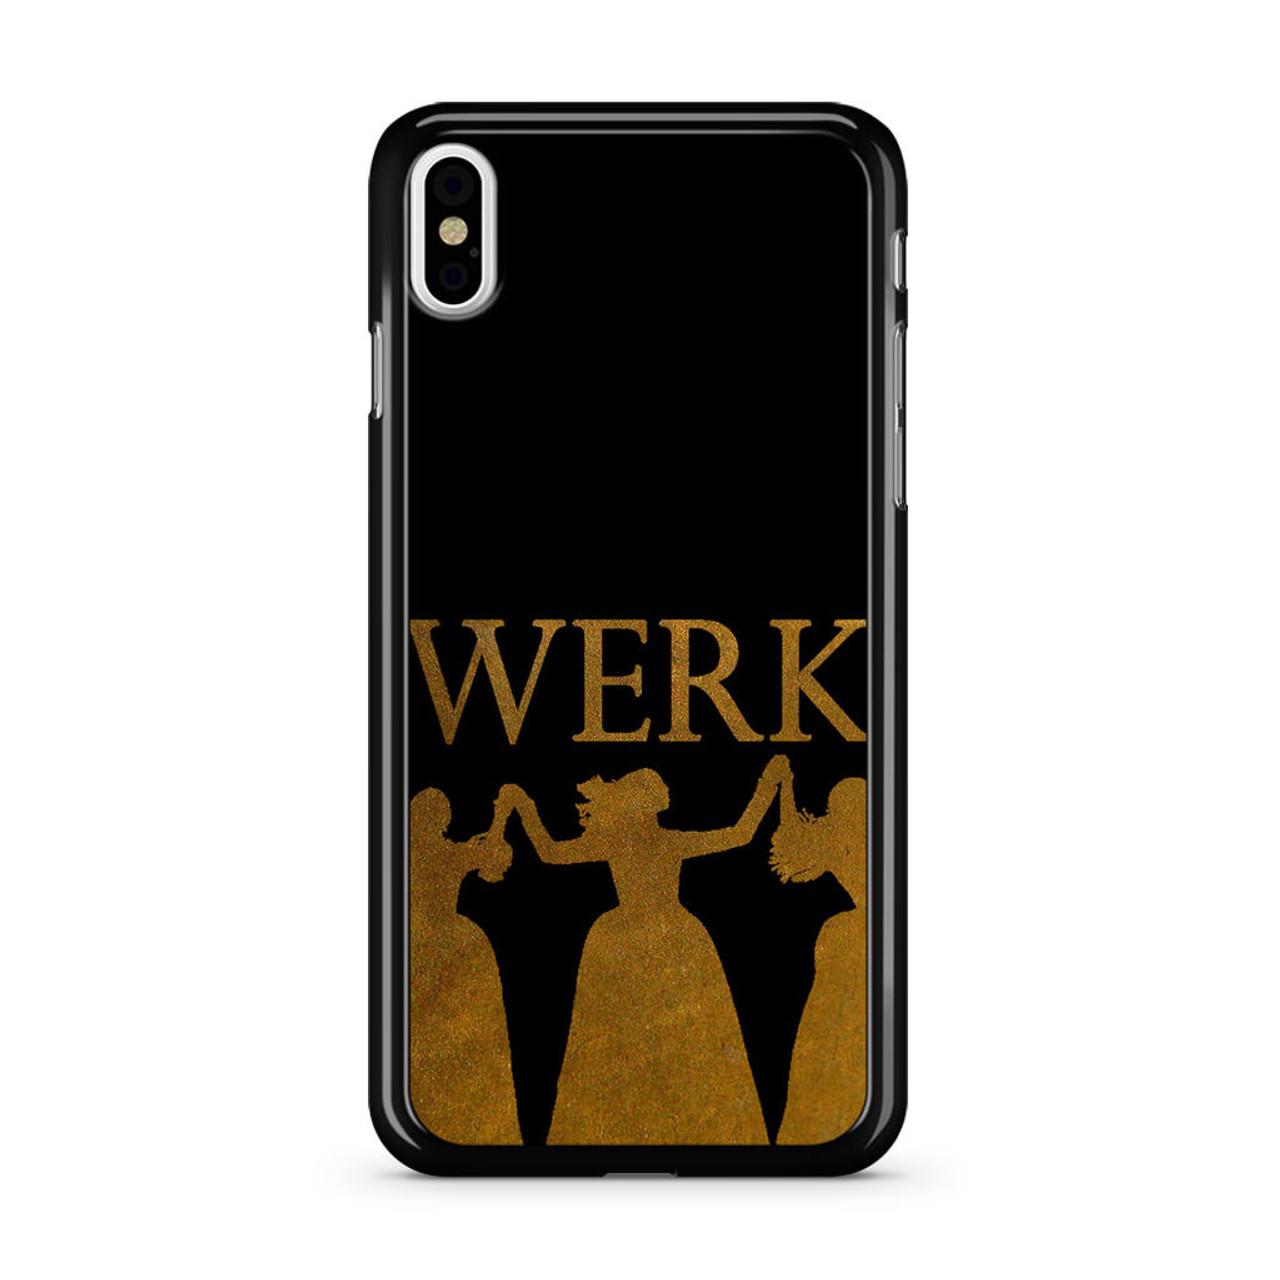 low priced 325fc b1a1e Hamilton Werk iPhone X Case